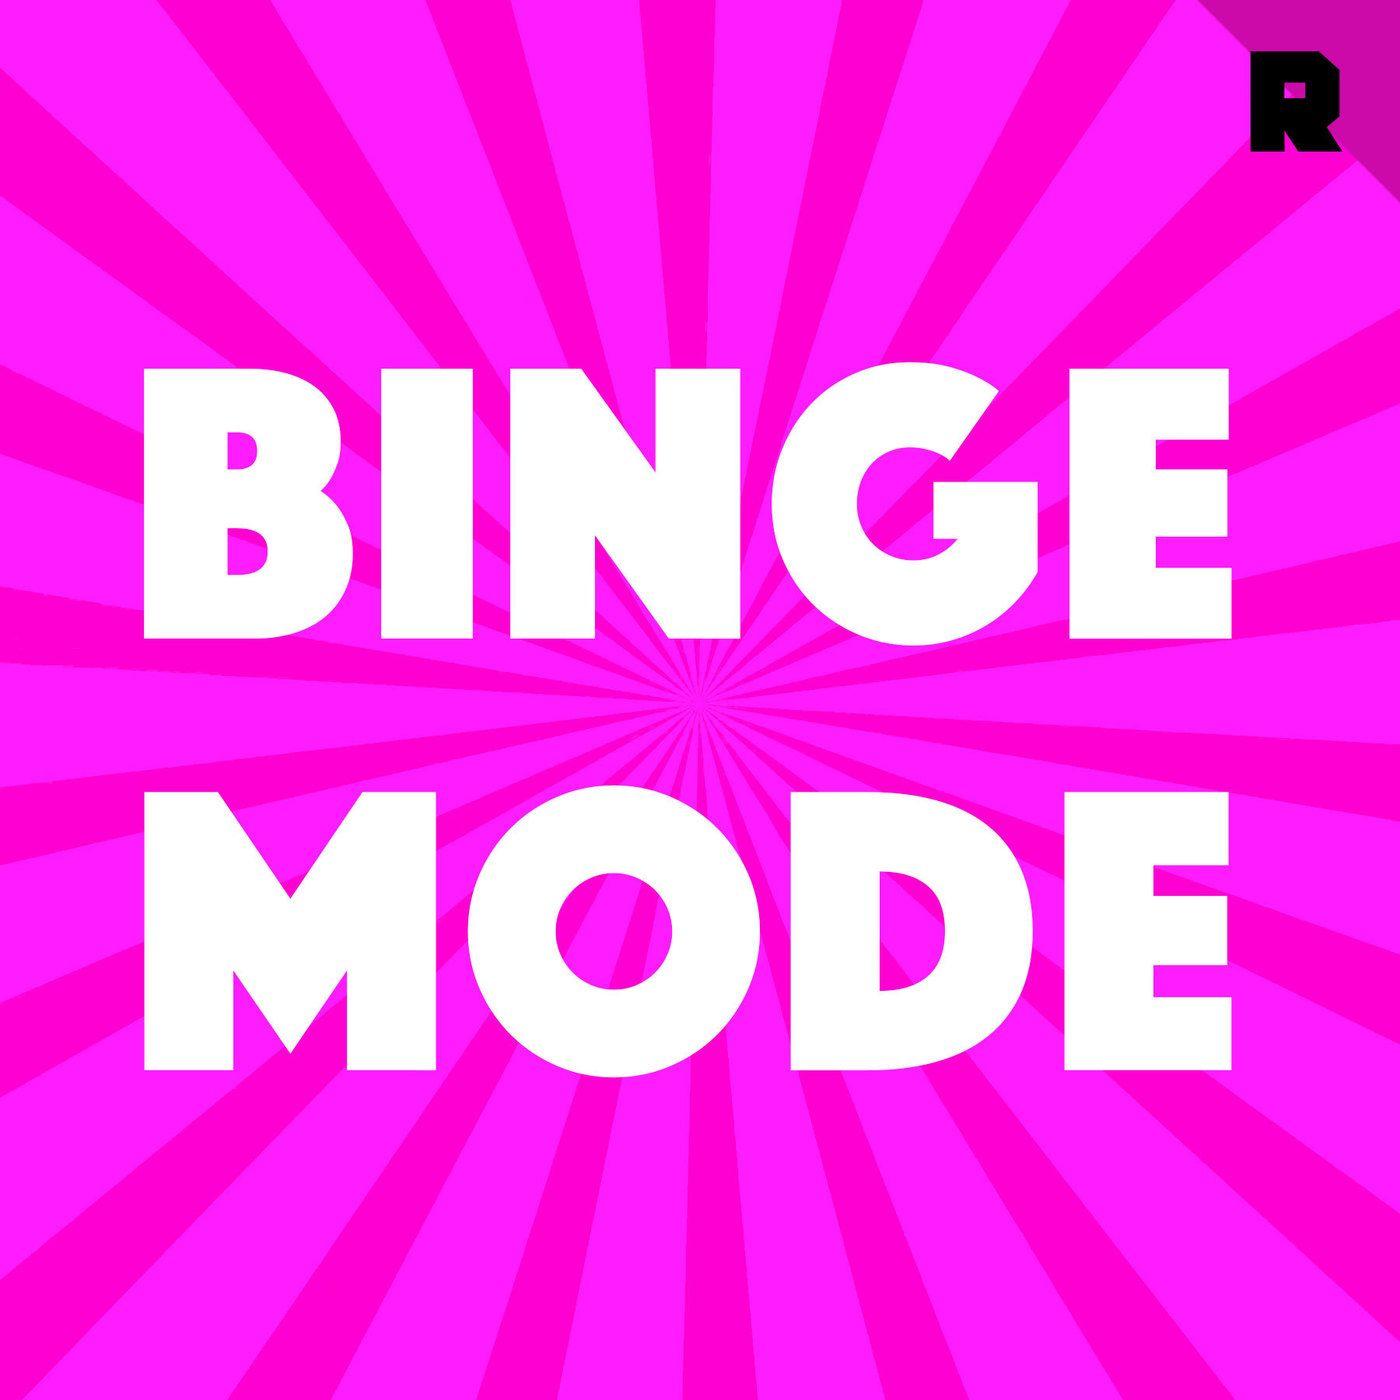 'Binge Mode: Weekly' Trailer